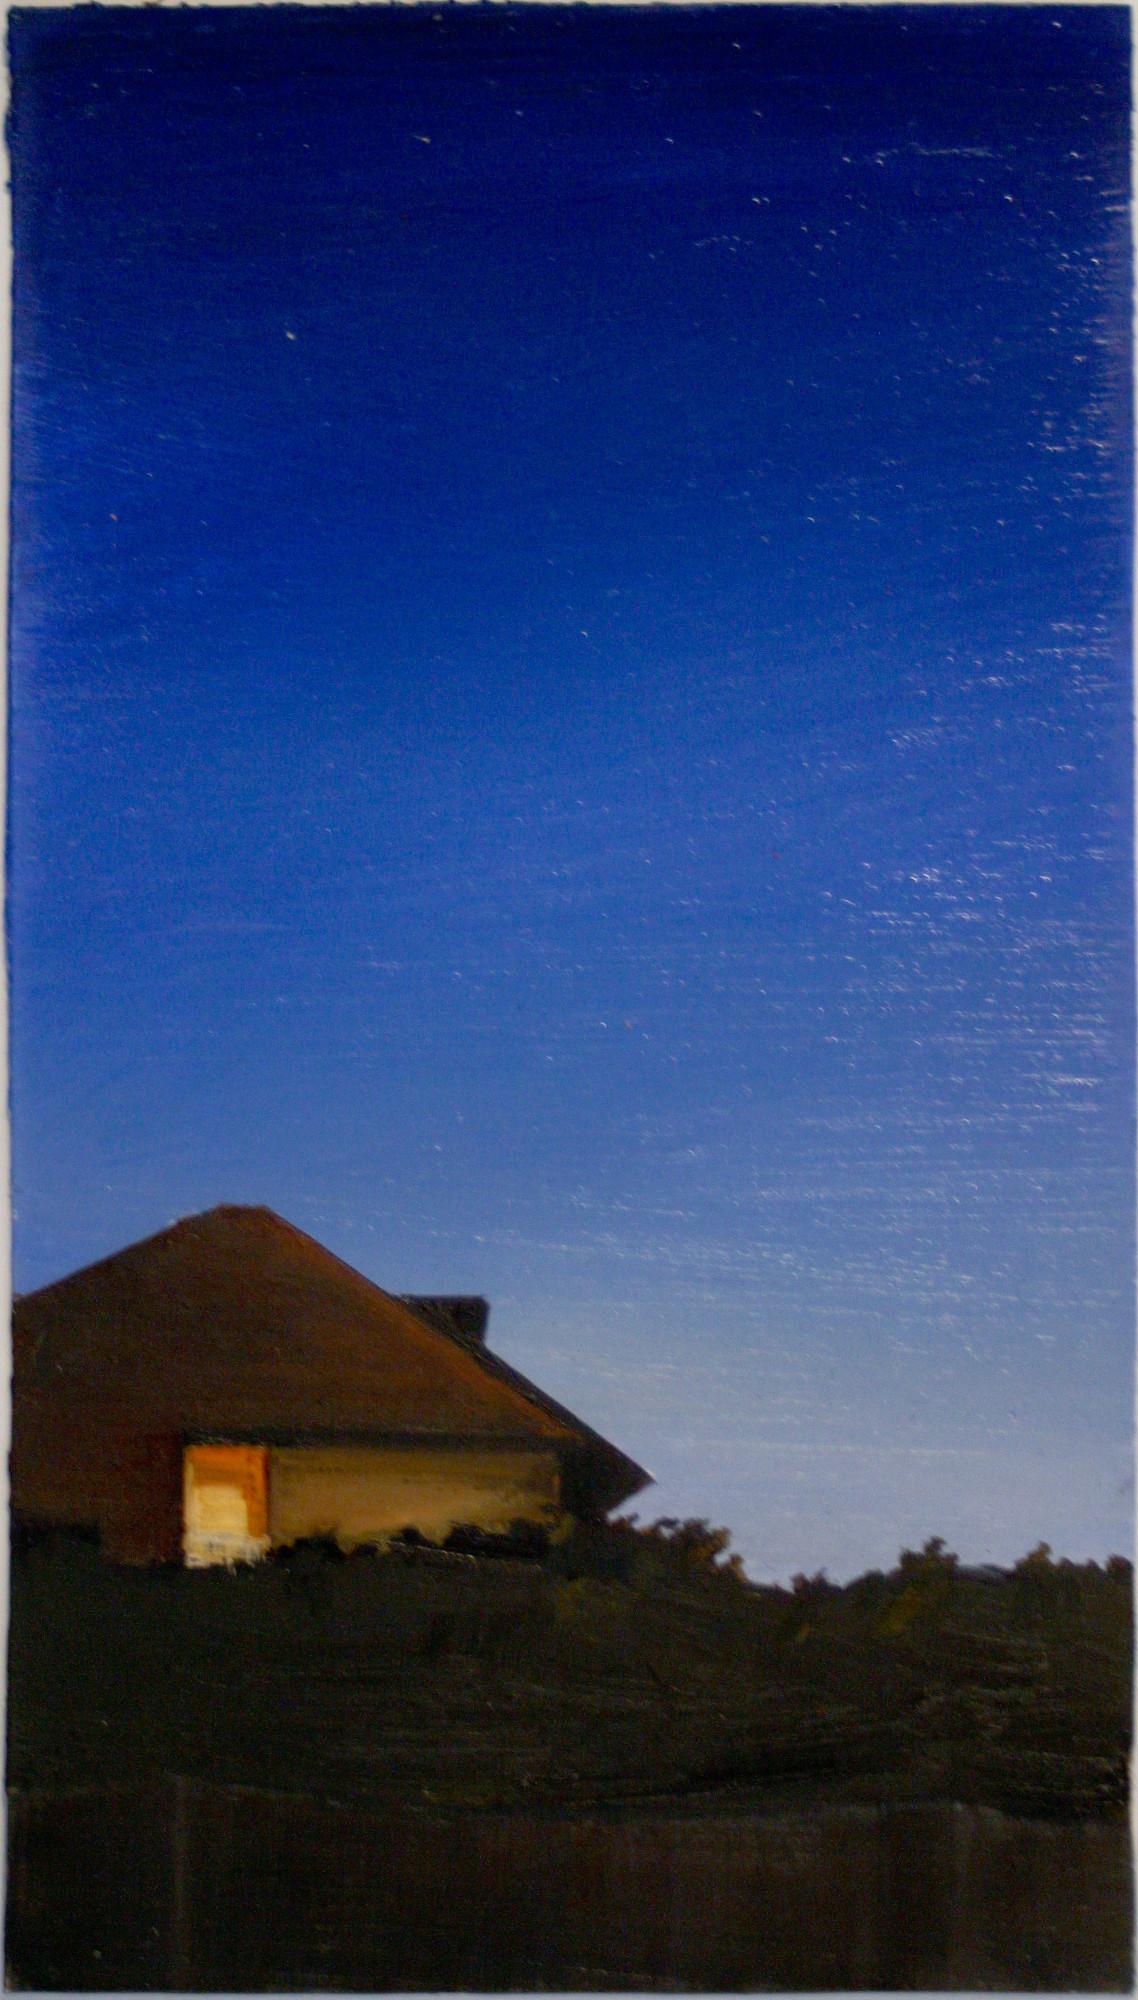 Strange Boy Suburbia Origins The Violet Hour (Mr James) by Selwyn Leamy